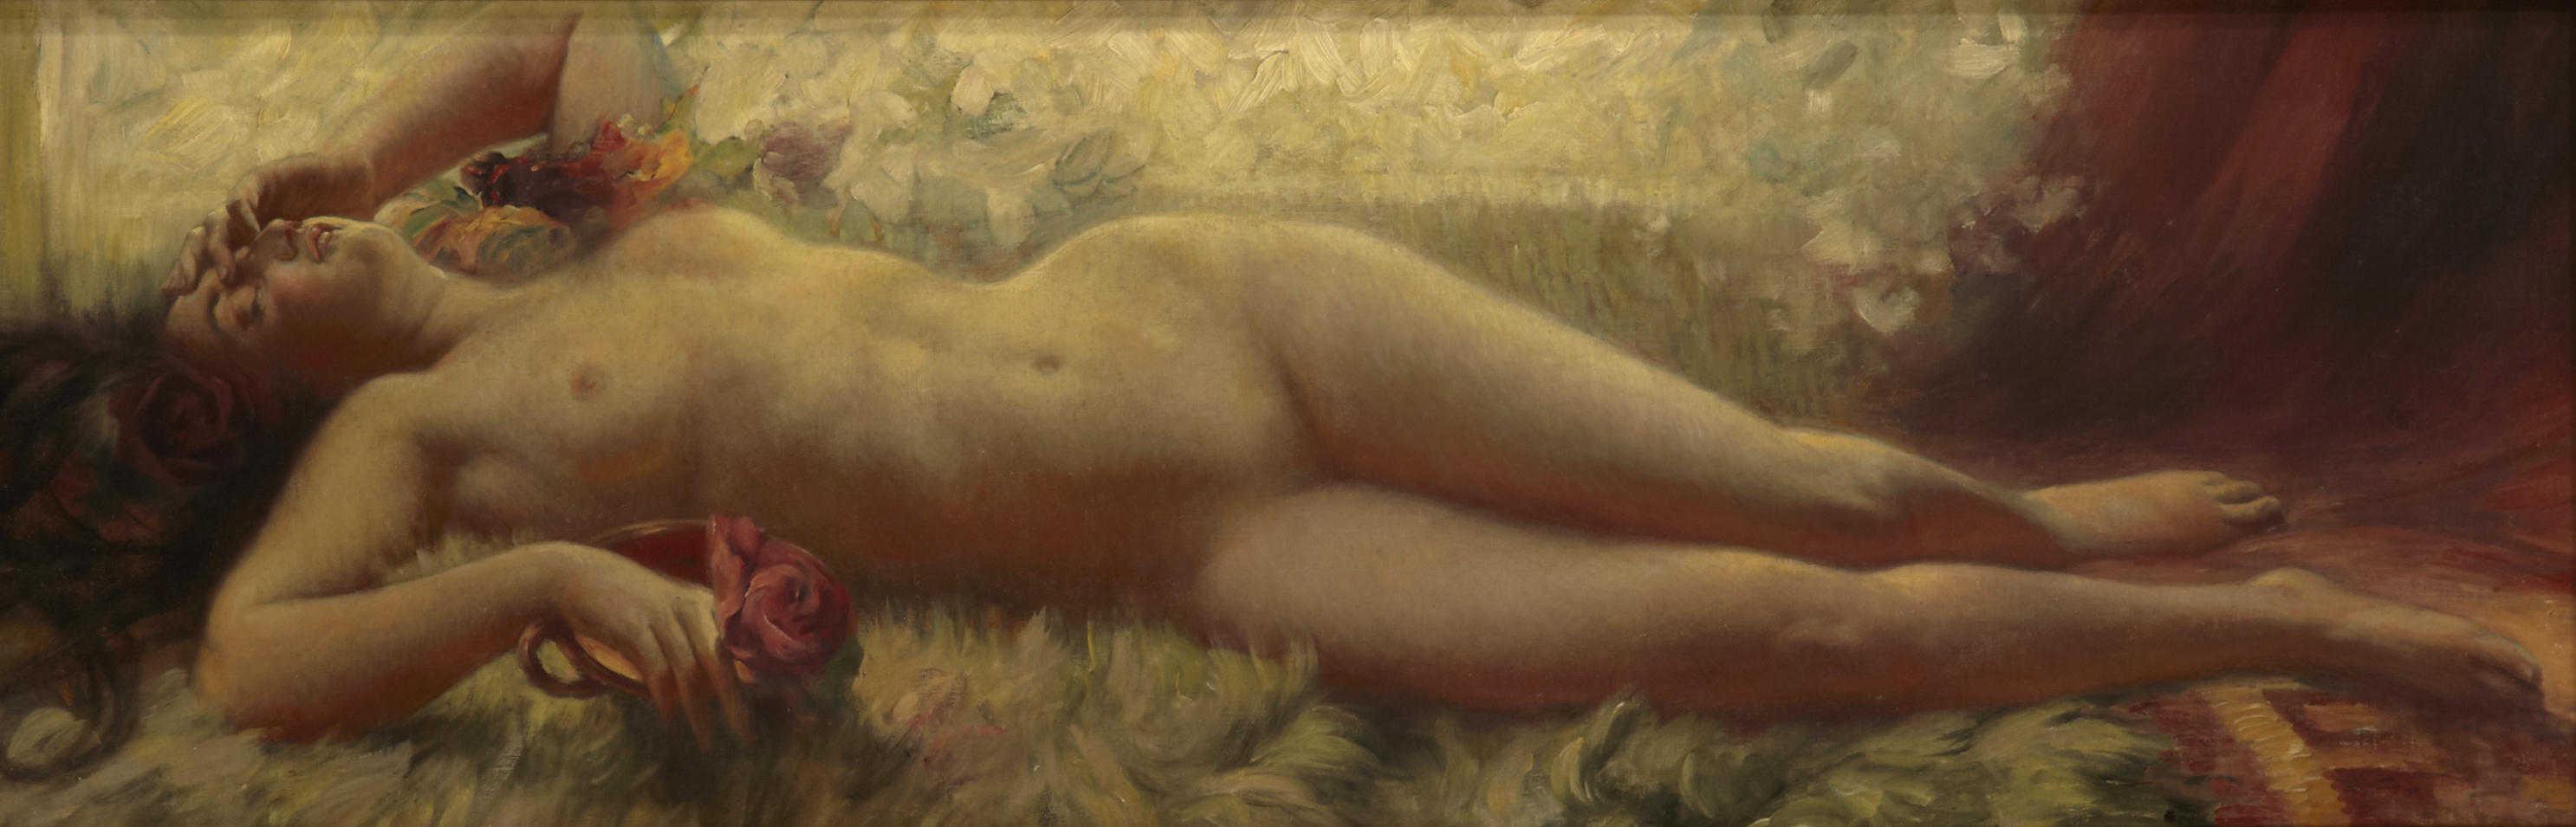 Eduard Buchler, 1861-1958. Лежащая обнаженная. 41.2 x 122.5 см. Частная коллекция